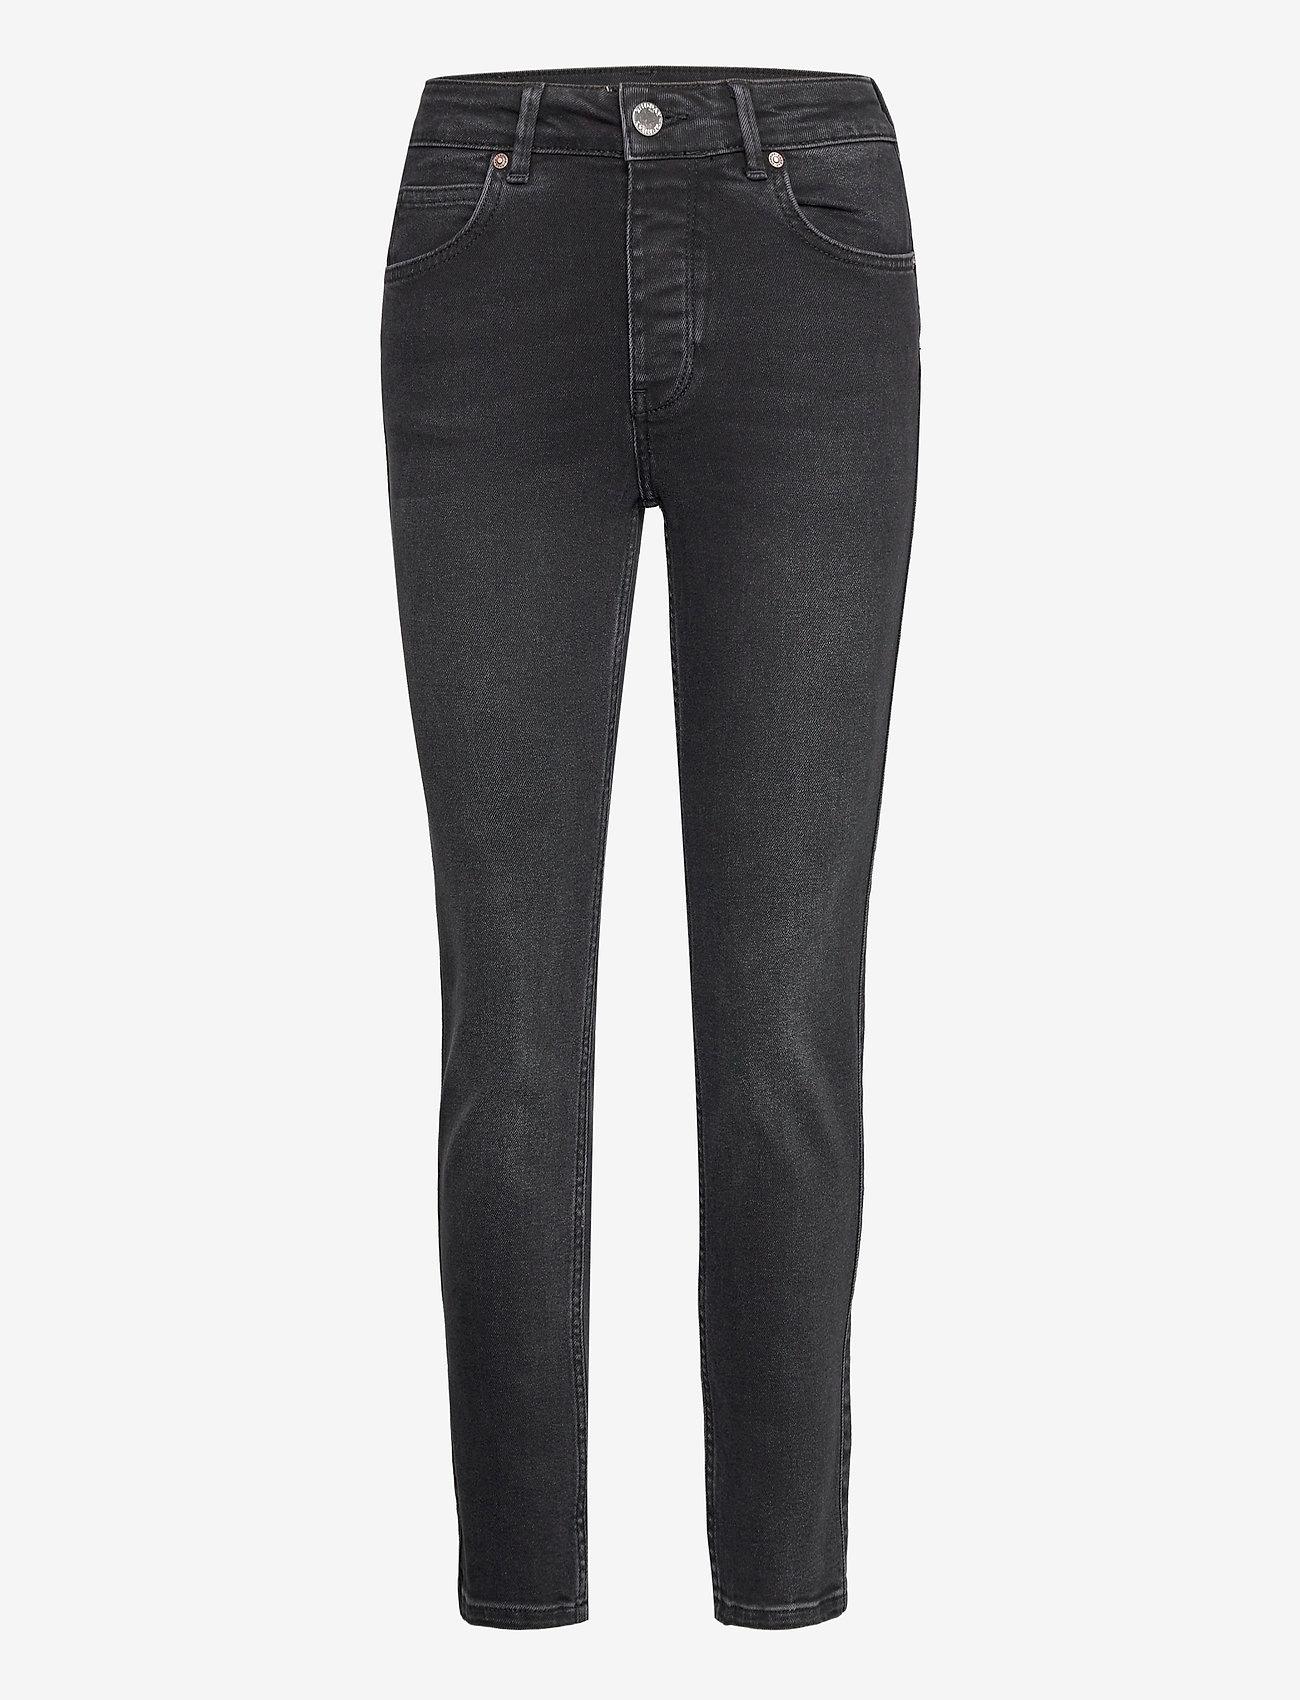 2NDDAY - 2ND Riggis Thinktwice - straight jeans - un black denim - 0